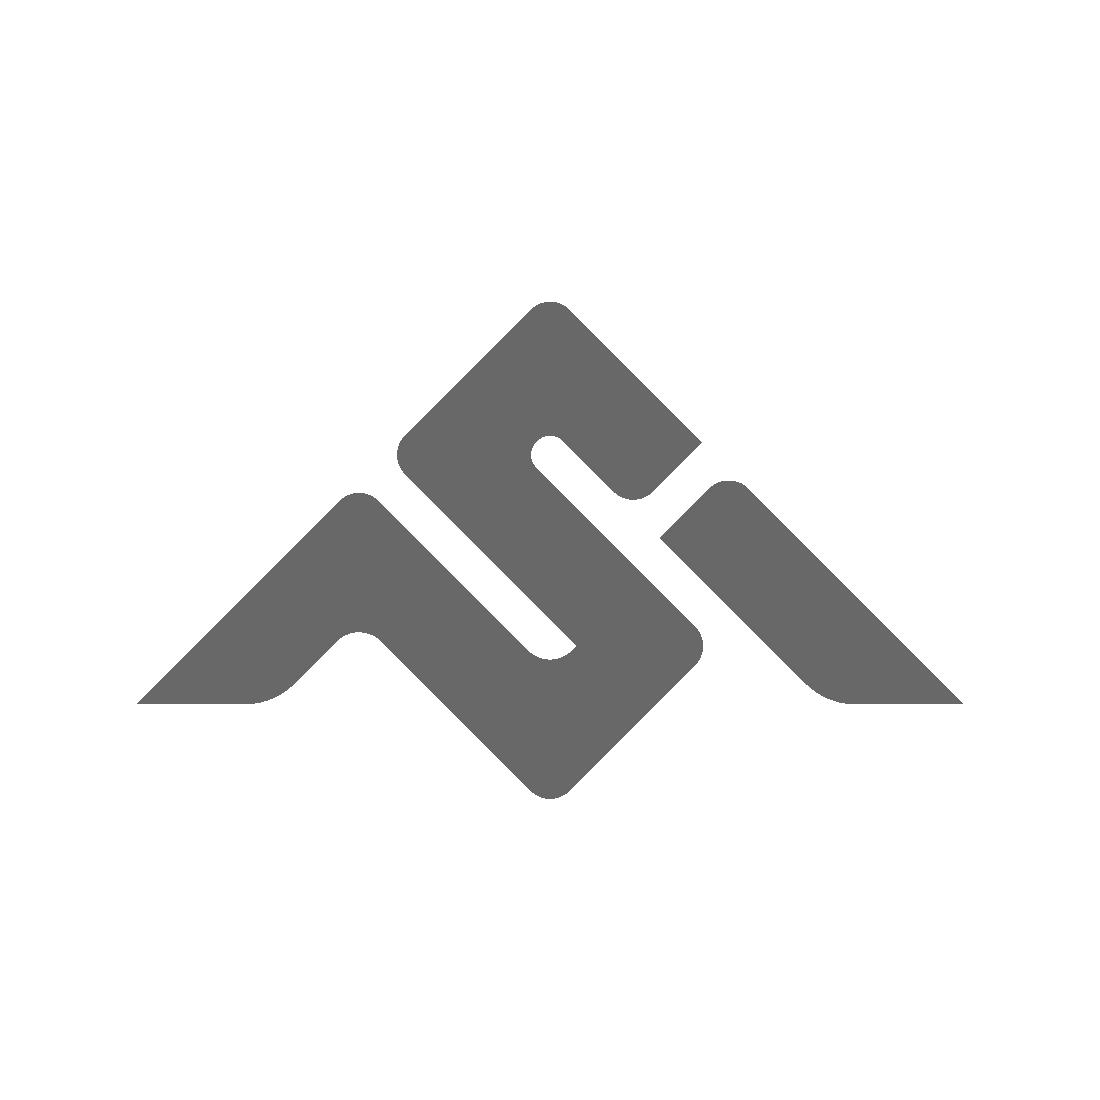 Shoe ASK EVE Red Alpina Shop Online Sportmania - Alpina ski shop